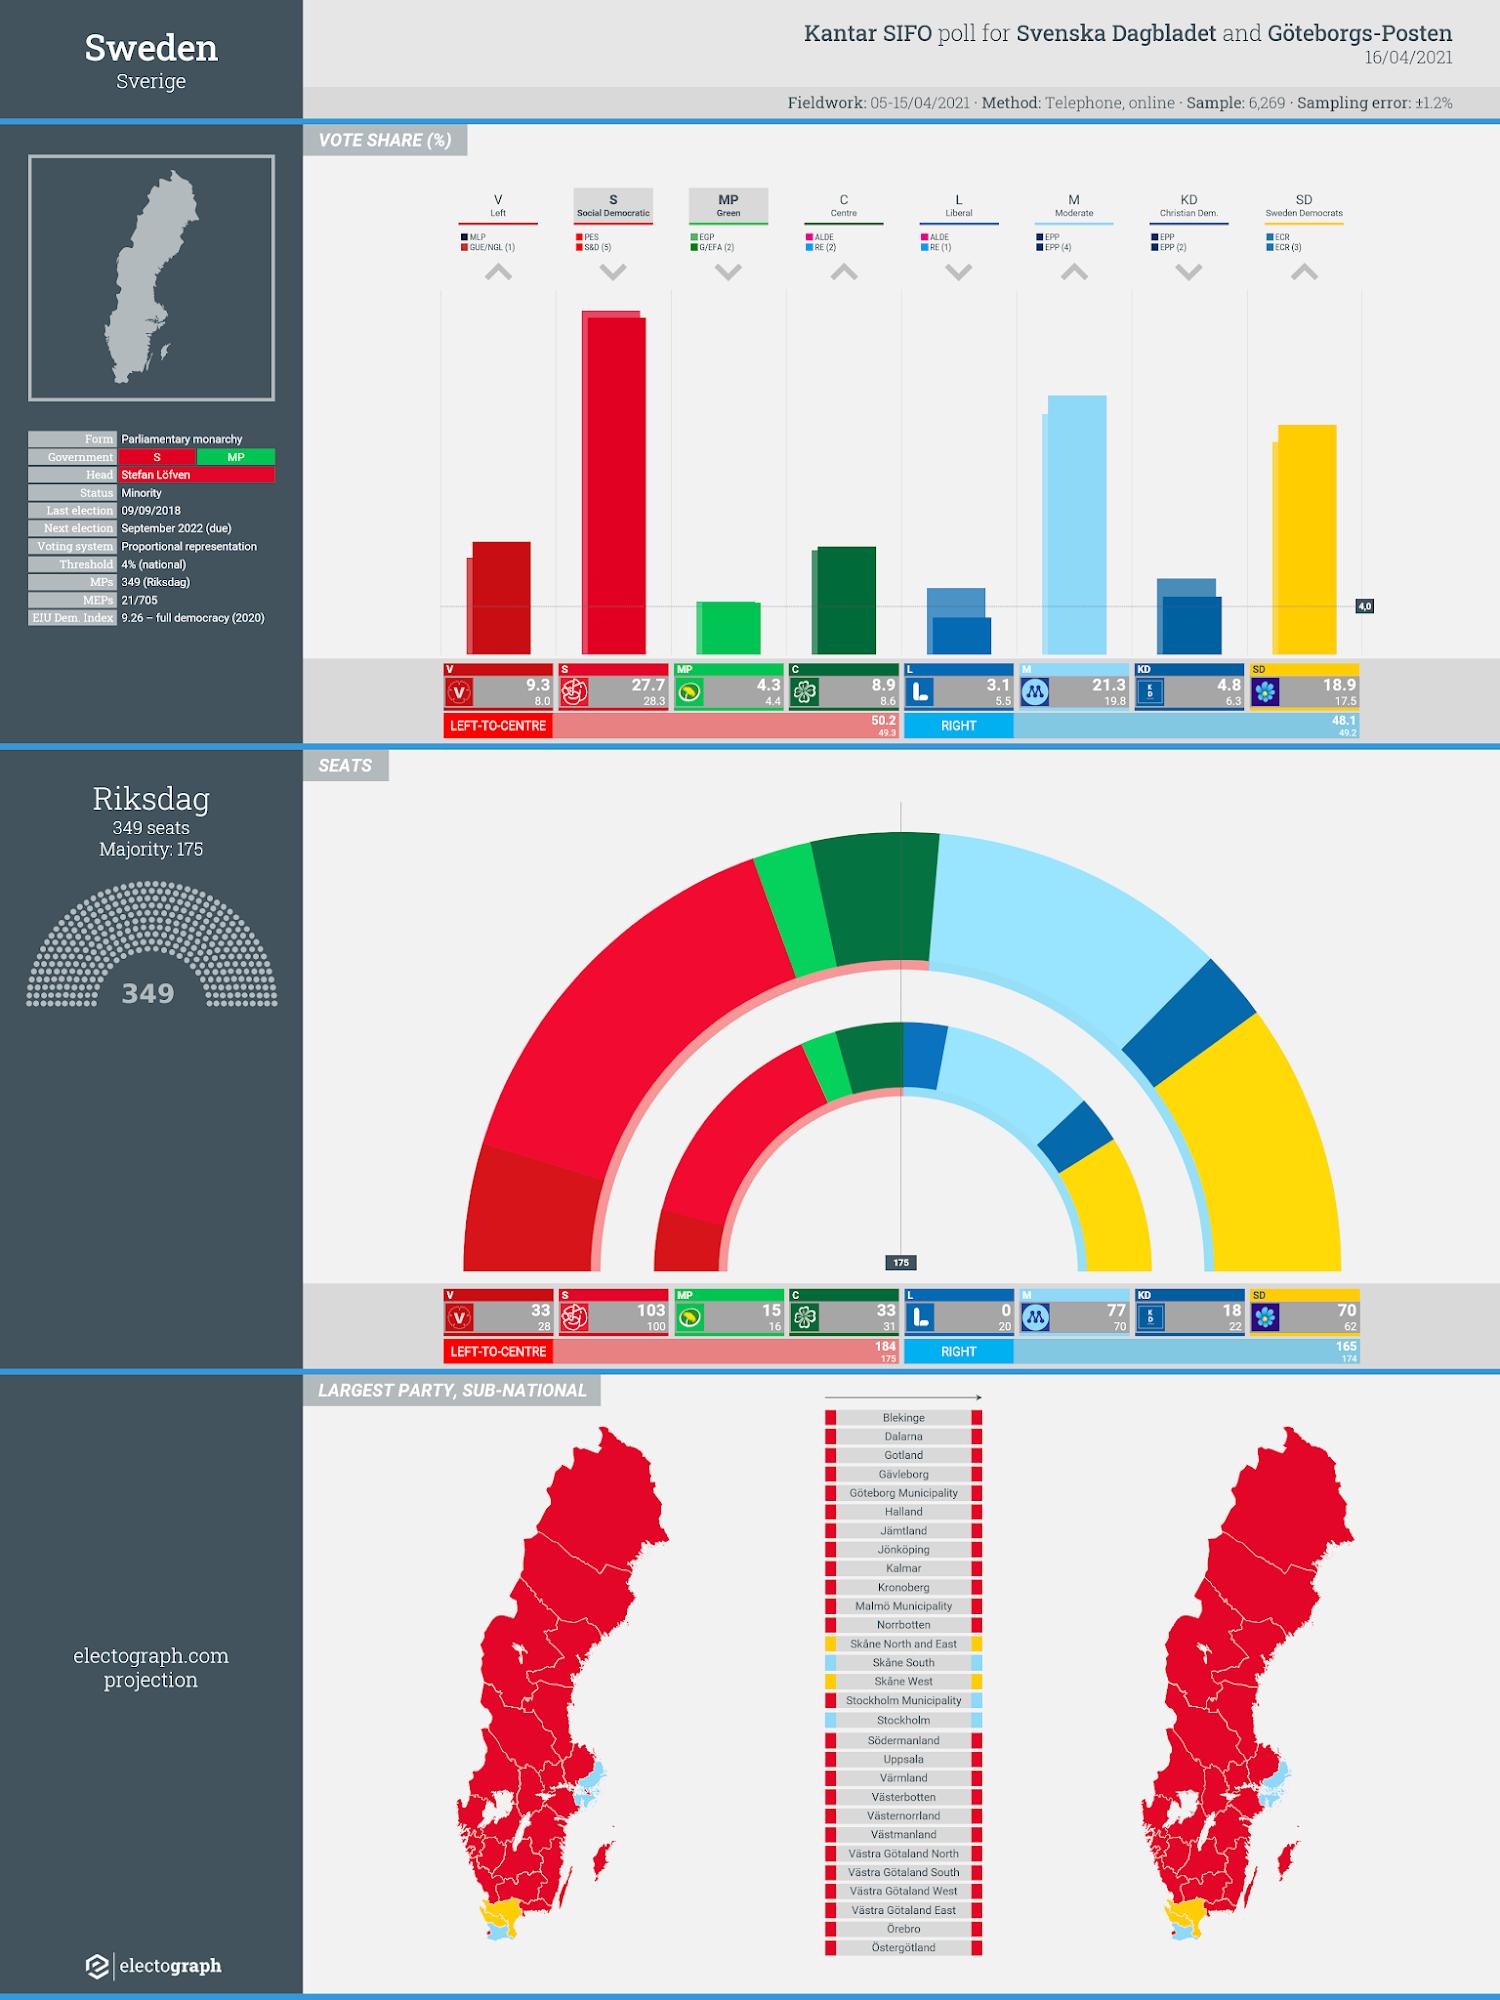 SWEDEN: Kantar SIFO poll chart for Svenska Dagbladet and Göteborgs-Posten, 16 April 2021